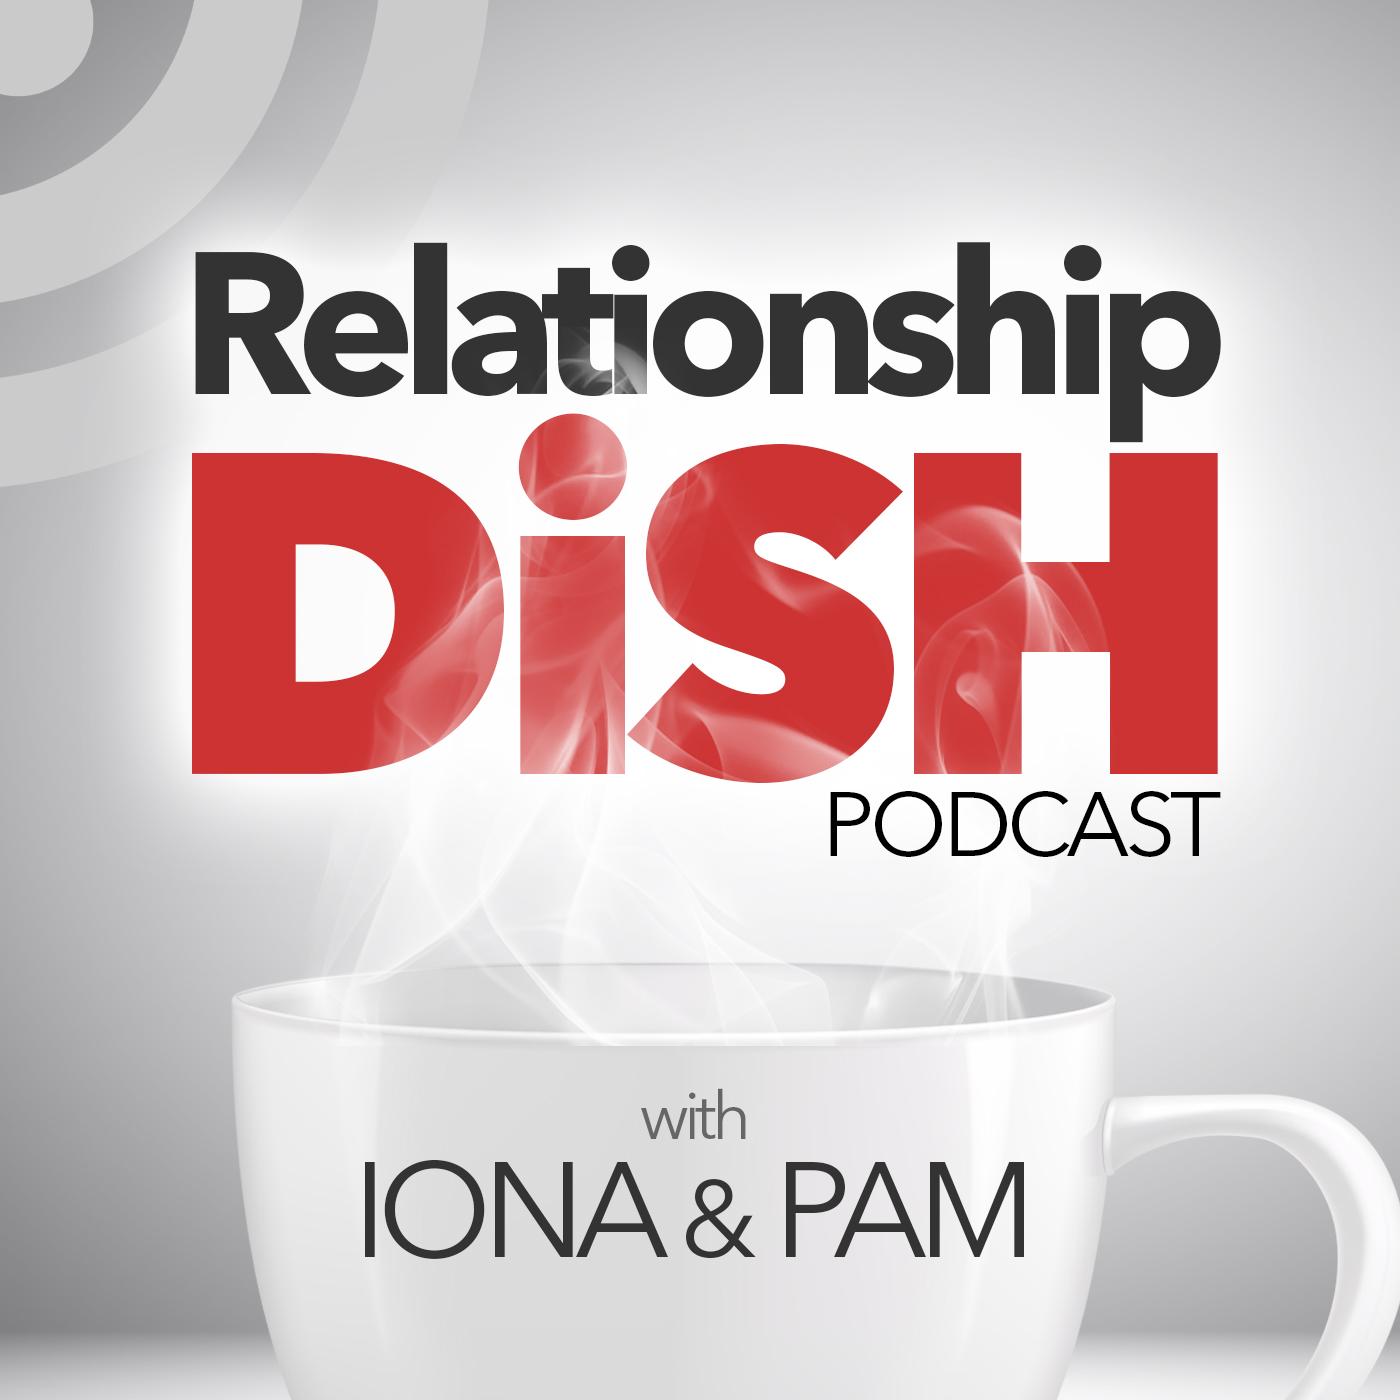 Relationship Dish - Season 4 Welcome!